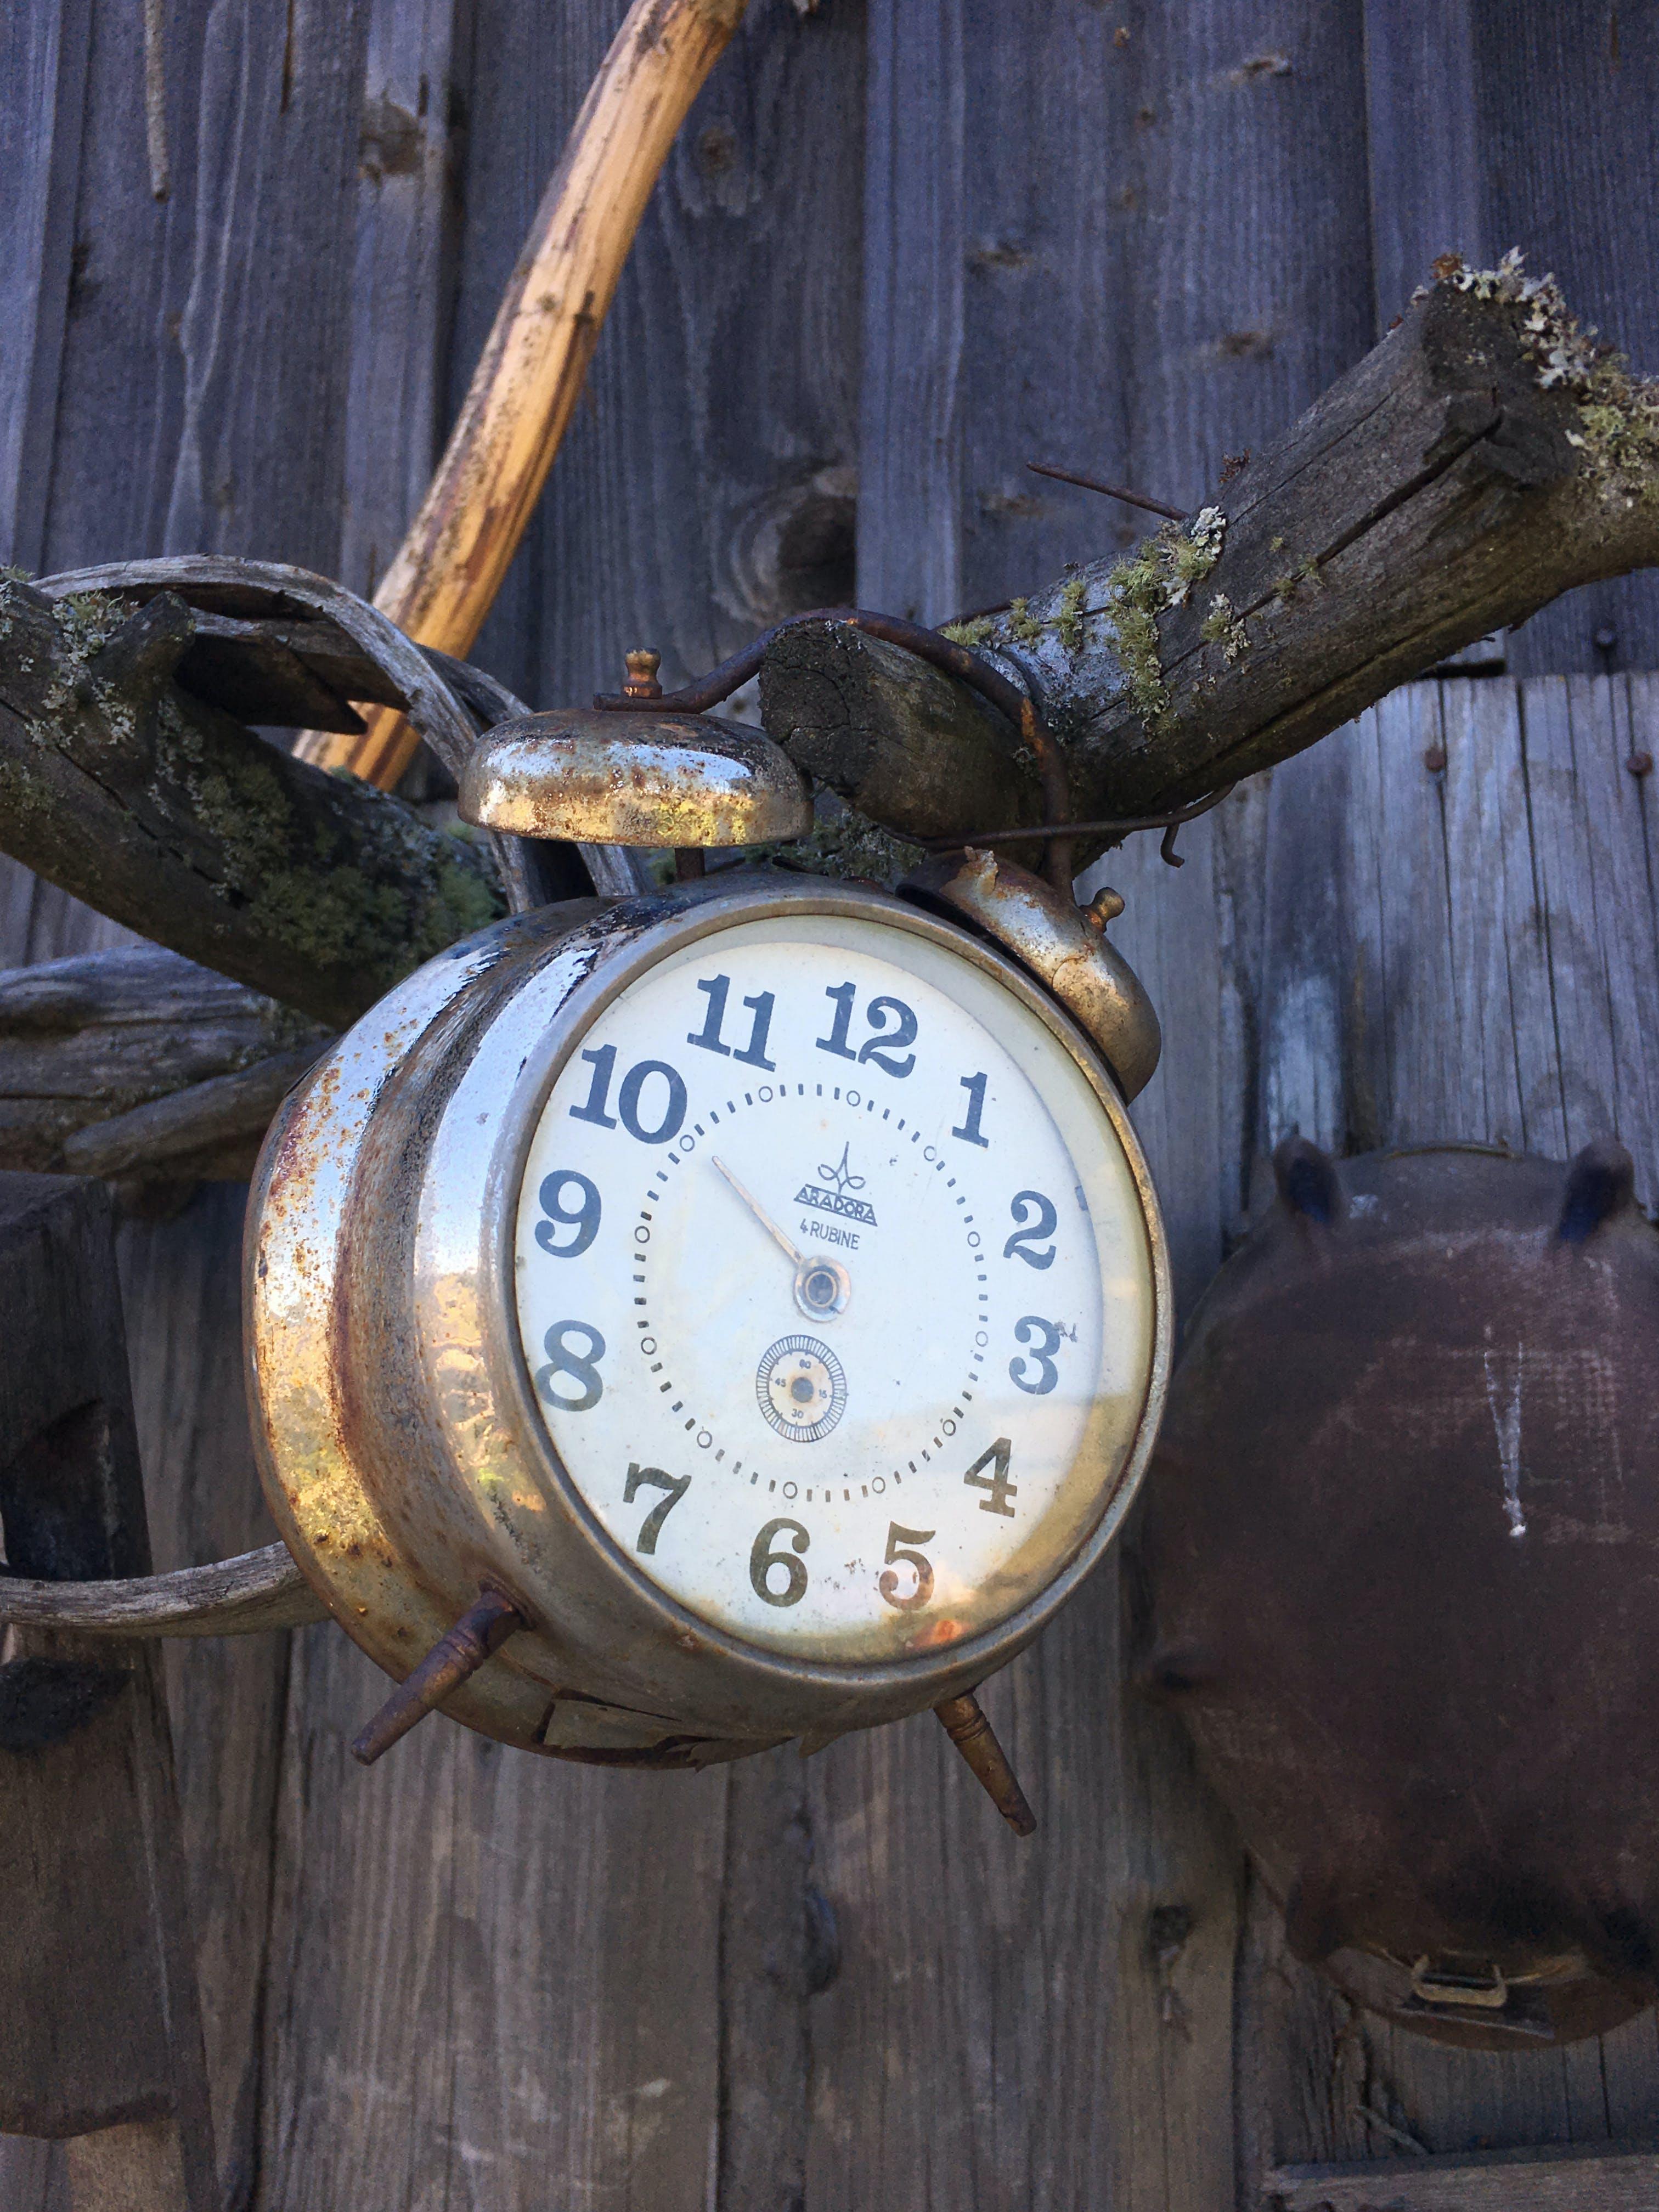 Free stock photo of alarm clock, old clock, vintage clock